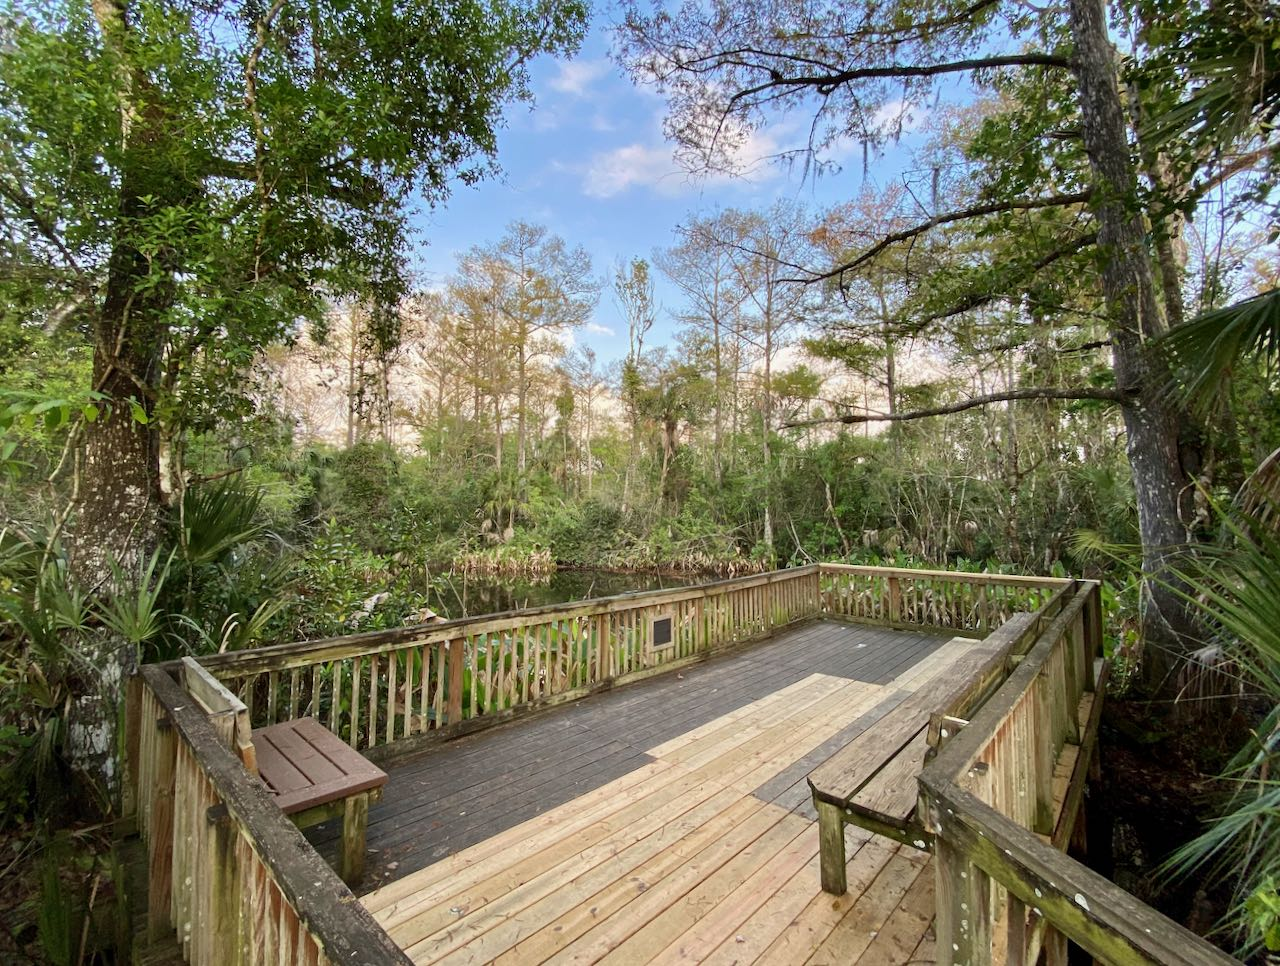 Big Cypress Boardwalk 17 steder å stoppe langs Tamiami Trail/ U.S Highway 41